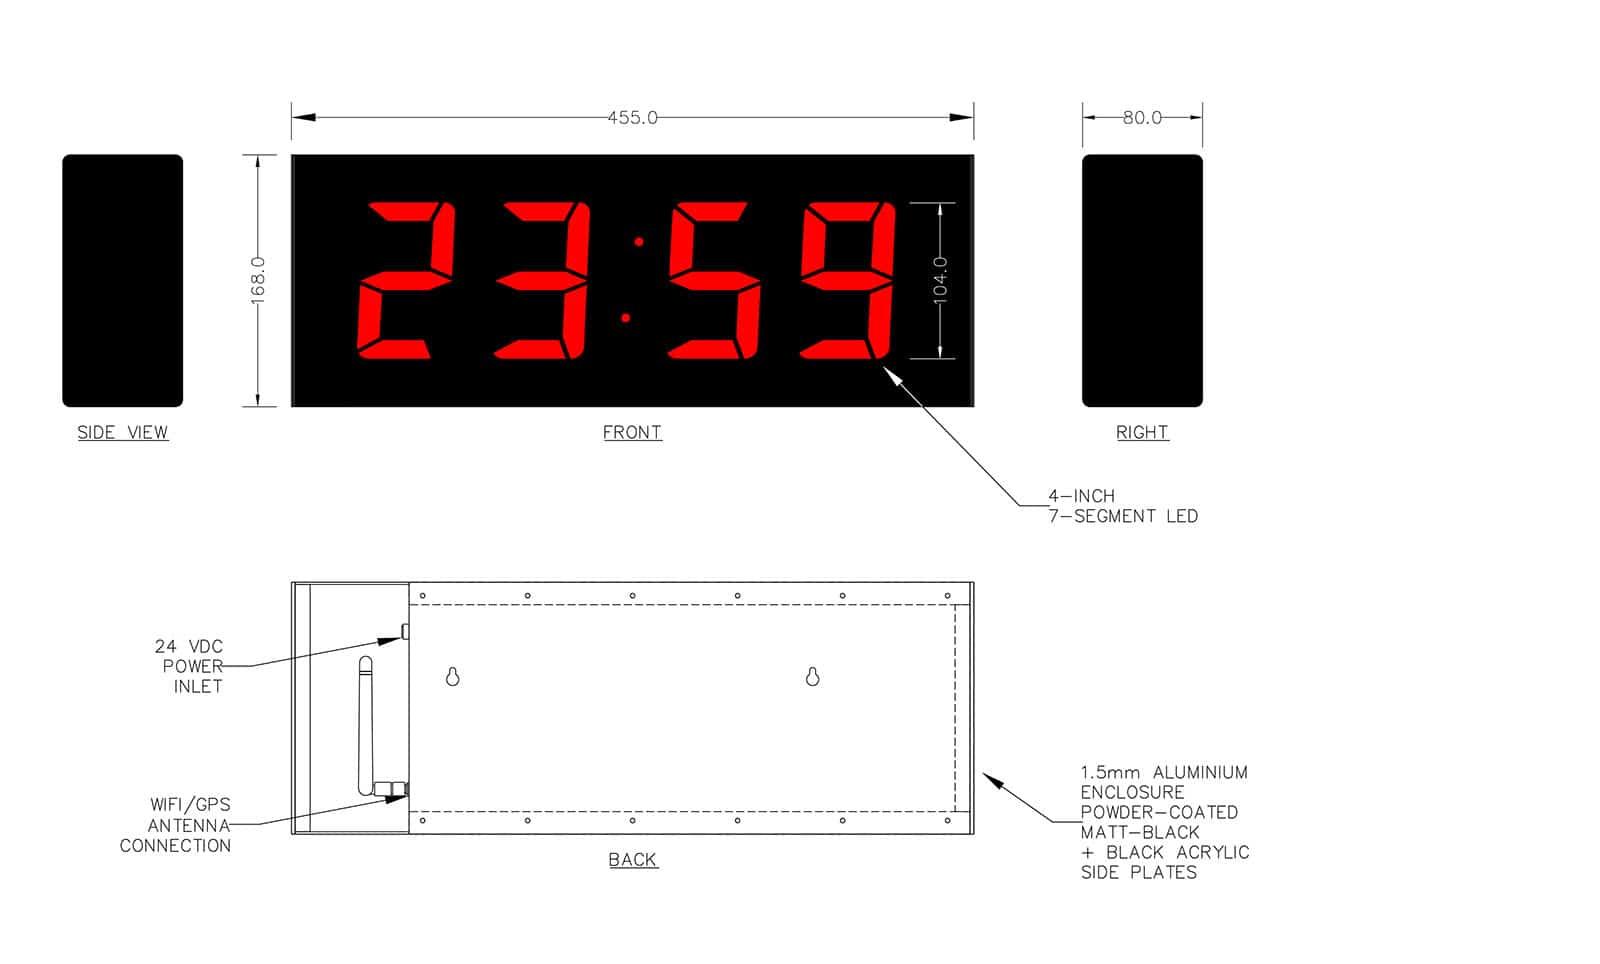 GPS Clocks: 24H Time Display w Second, Colon & Temperature